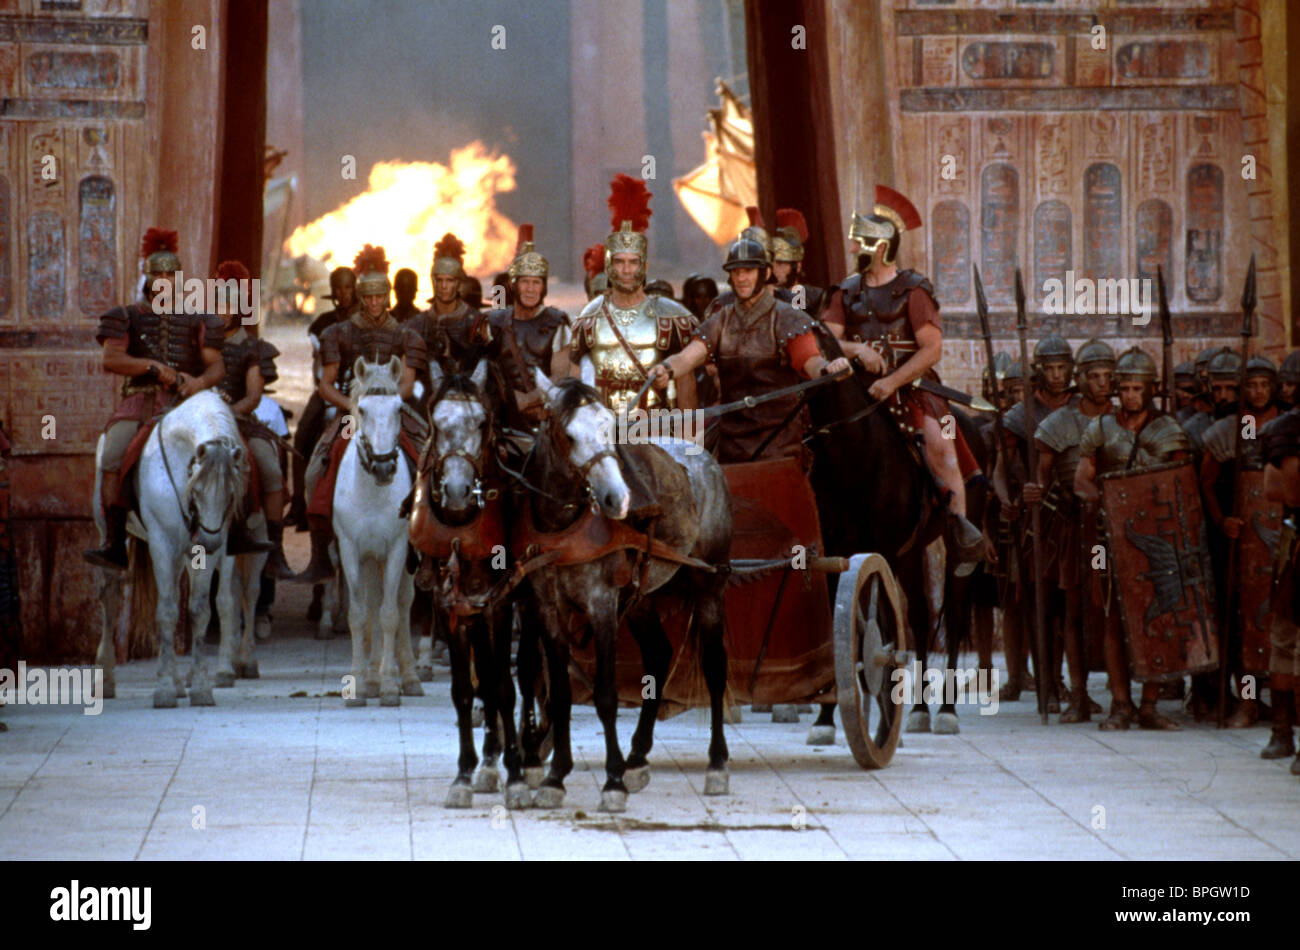 MOVIE SCENE CLEOPATRA (1999) - Stock Image